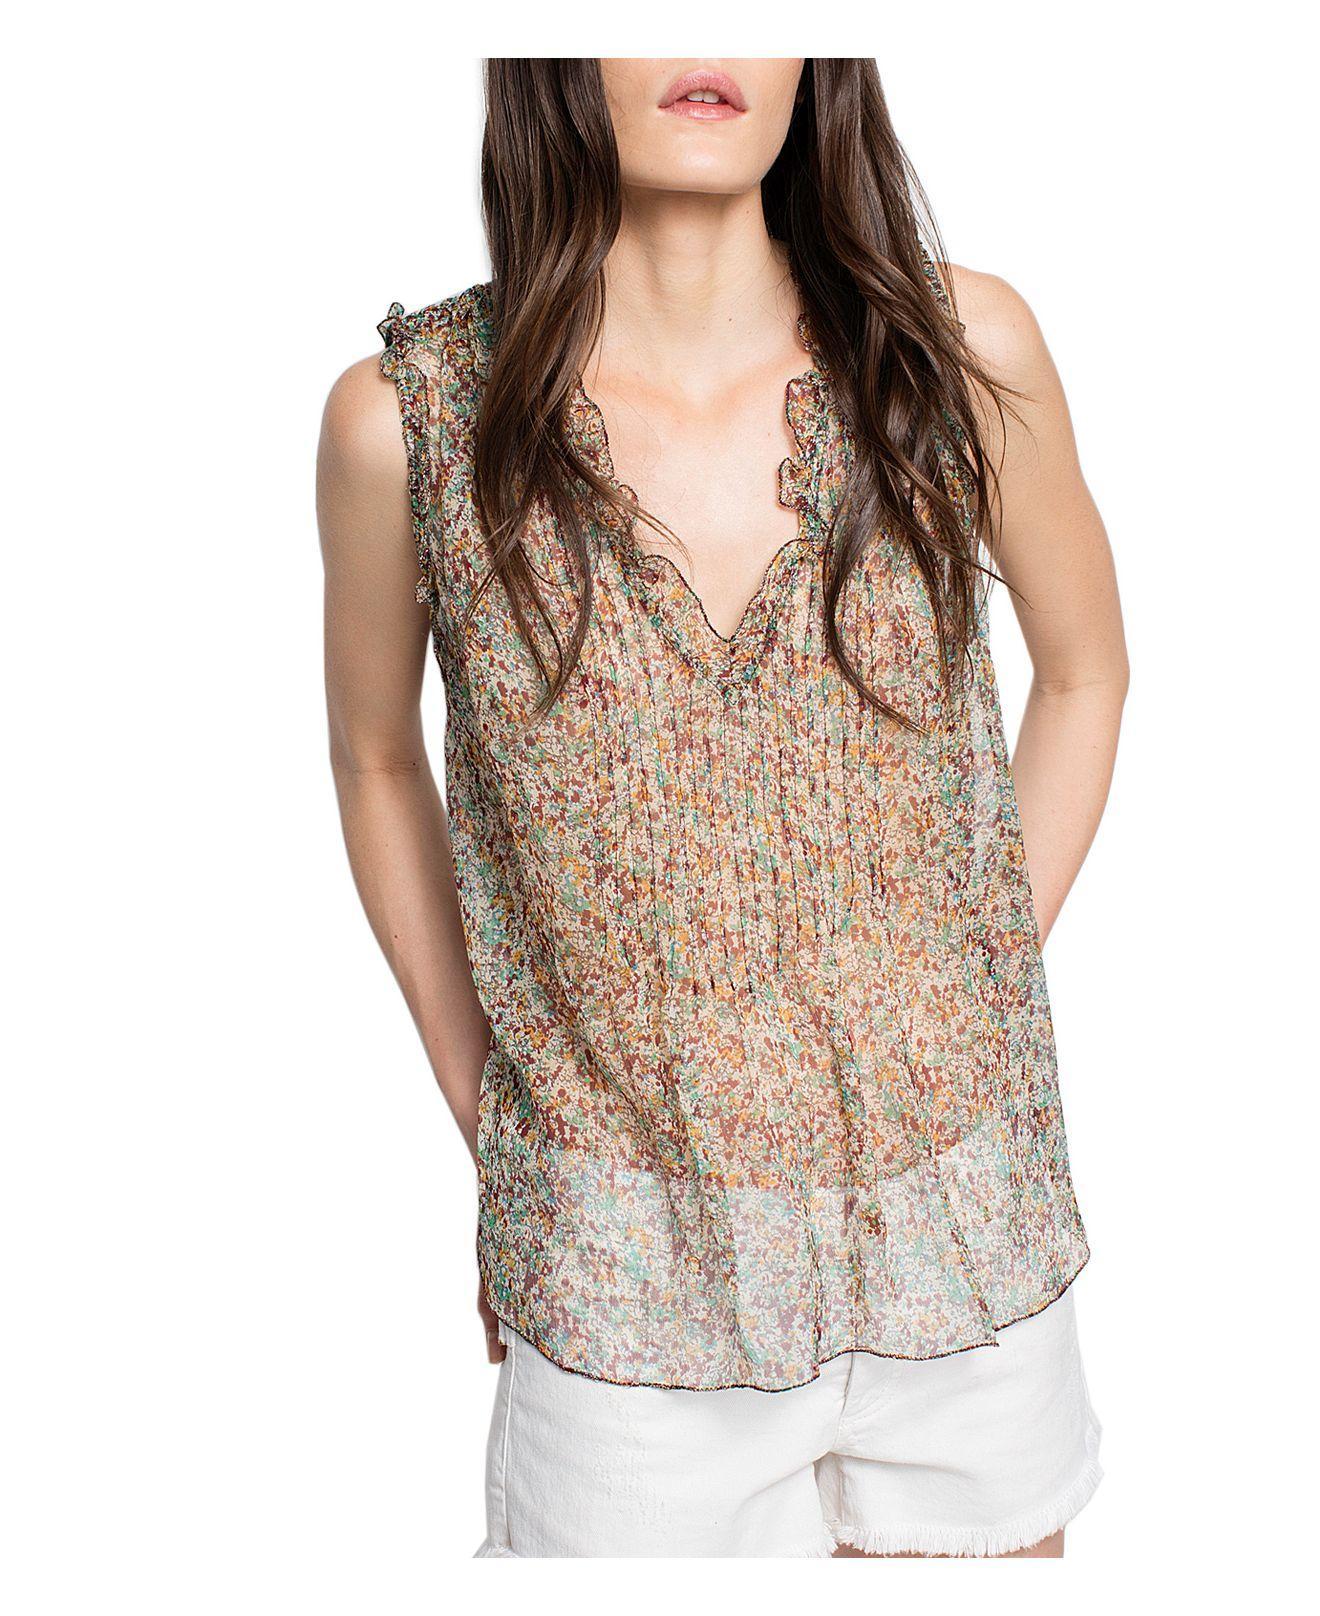 Womens Thym Floral Silk Chiffon Blouse Zadig & Voltaire Discount Sast Authentic Sale Online Discount Shop Offer 7PXDX